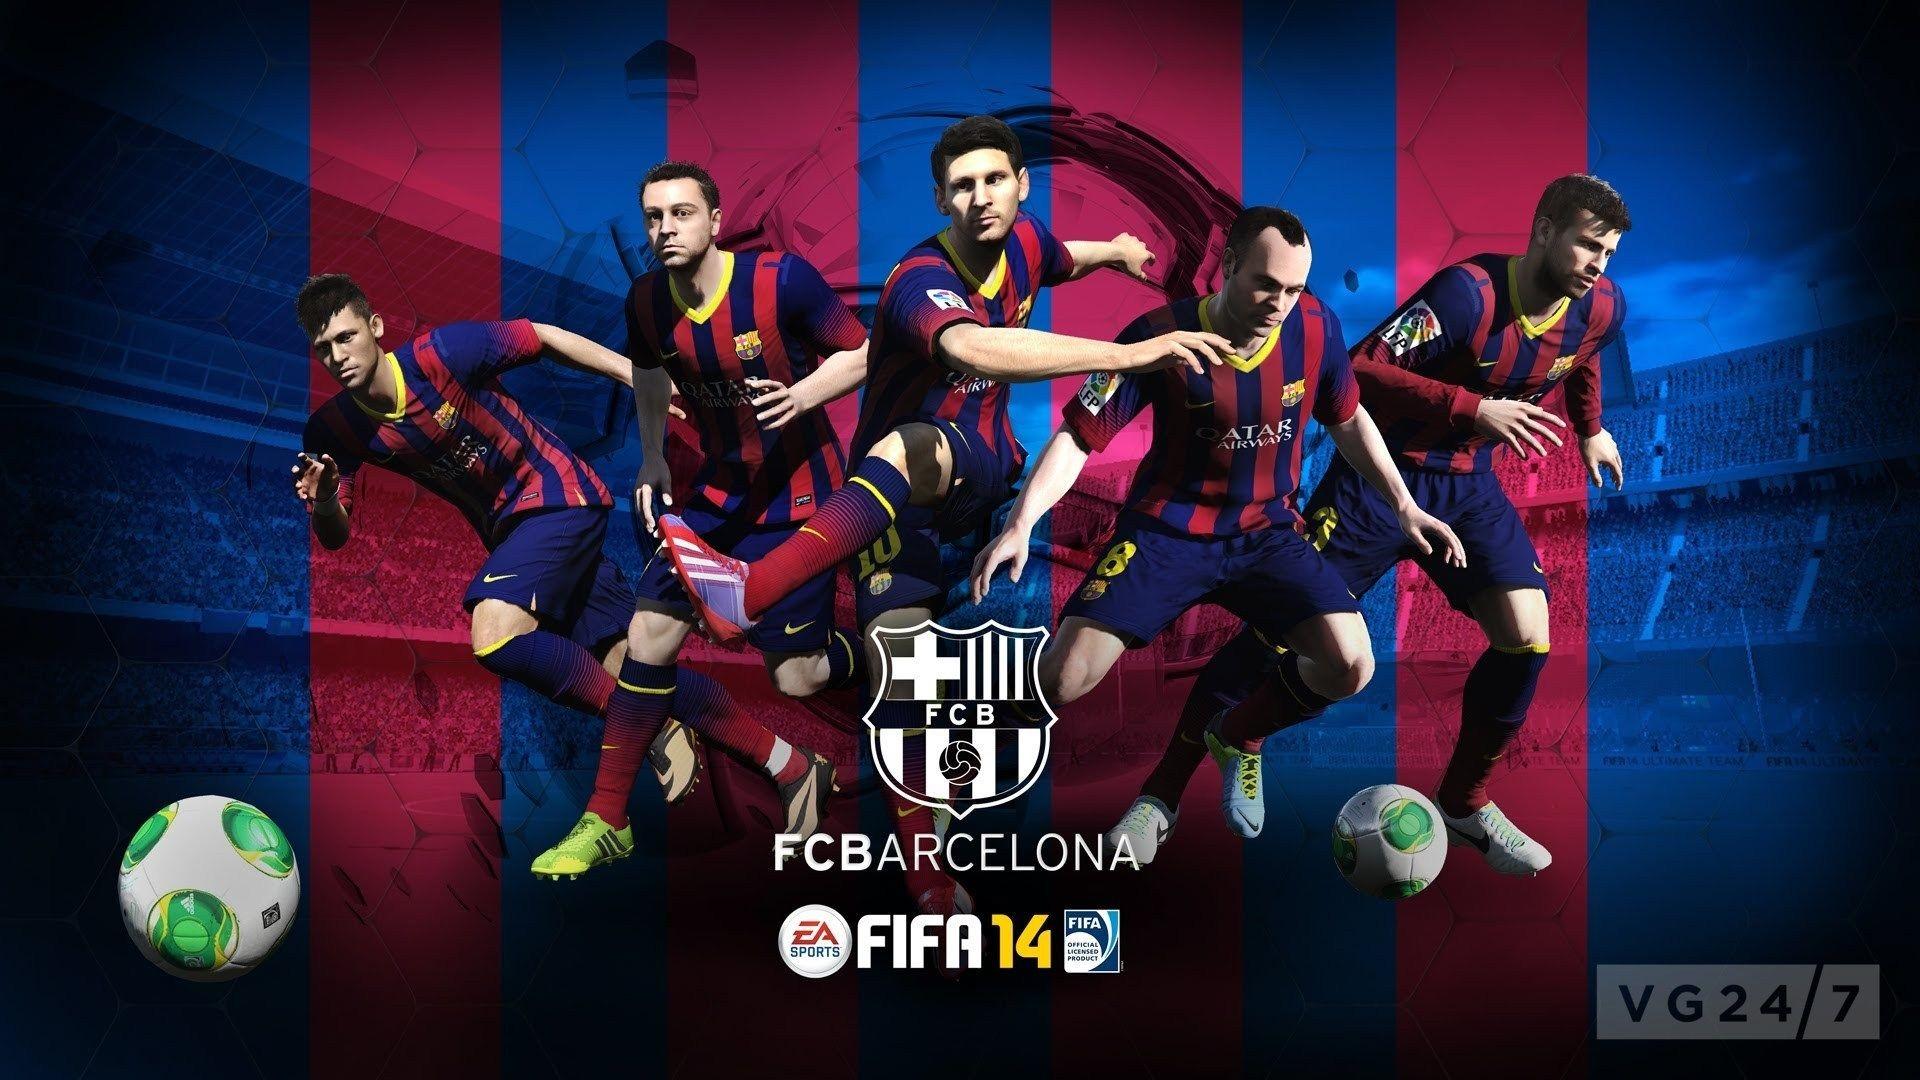 FC Barcelona FIFA football games wallpaper backgrounds – Football .